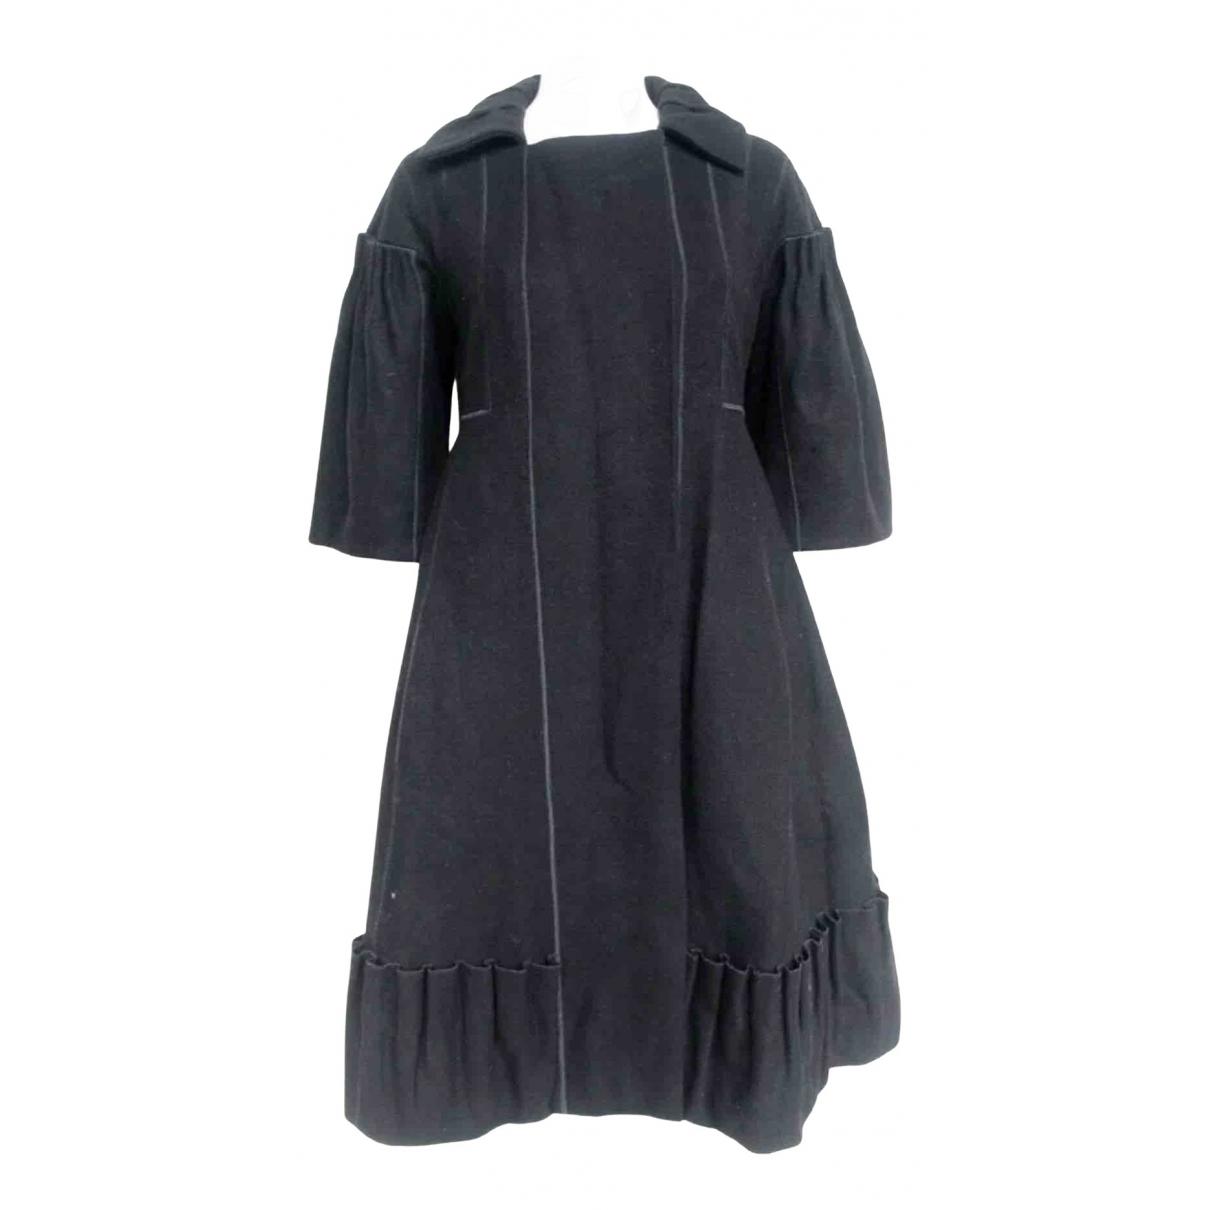 Louis Vuitton N Black Wool coat for Women 38 FR